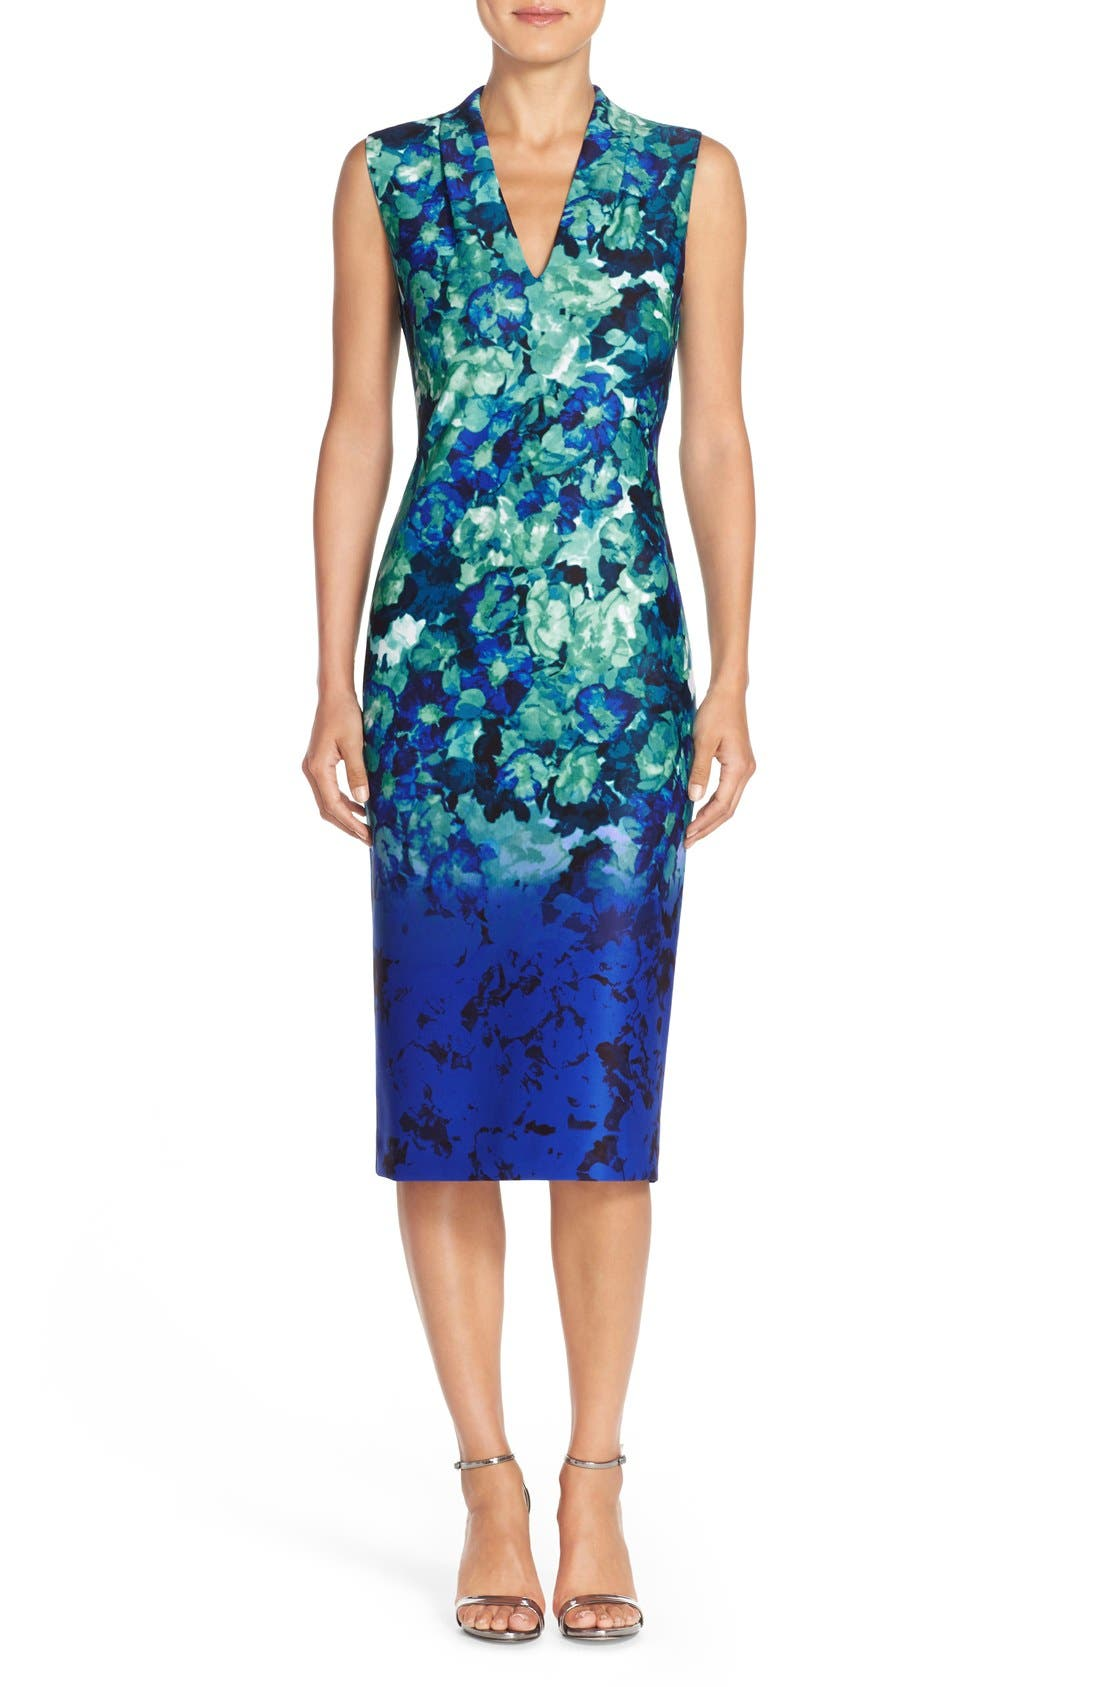 Alternate Image 1 Selected - Vince Camuto Floral Print Scuba Midi Dress